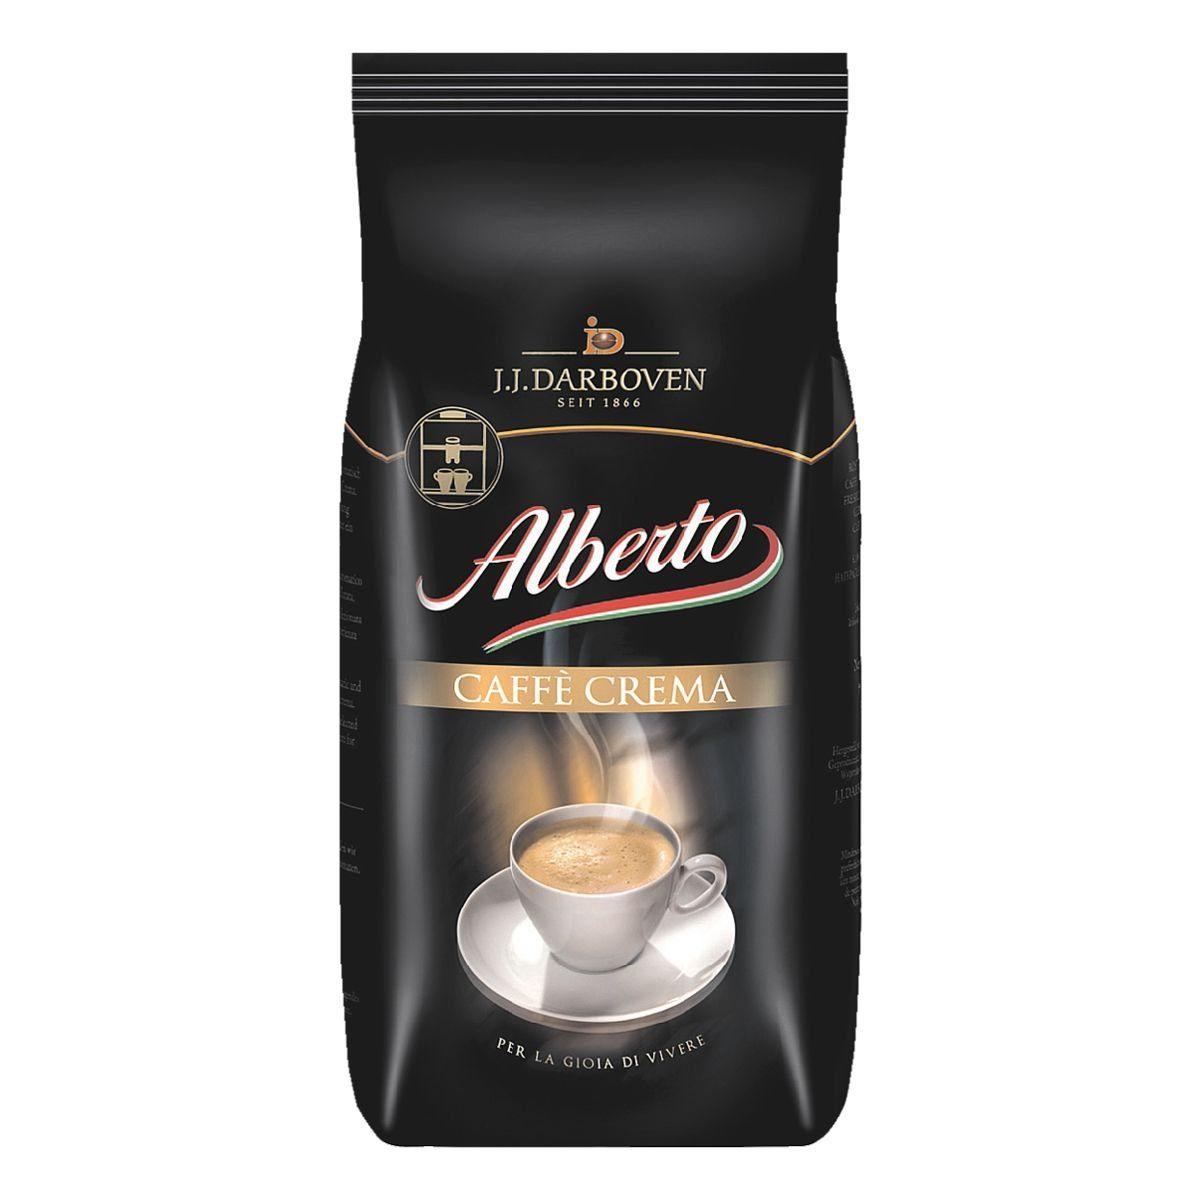 JJ.Darboven Kaffee - ganze Bohnen »Alberto Caffè Crema«